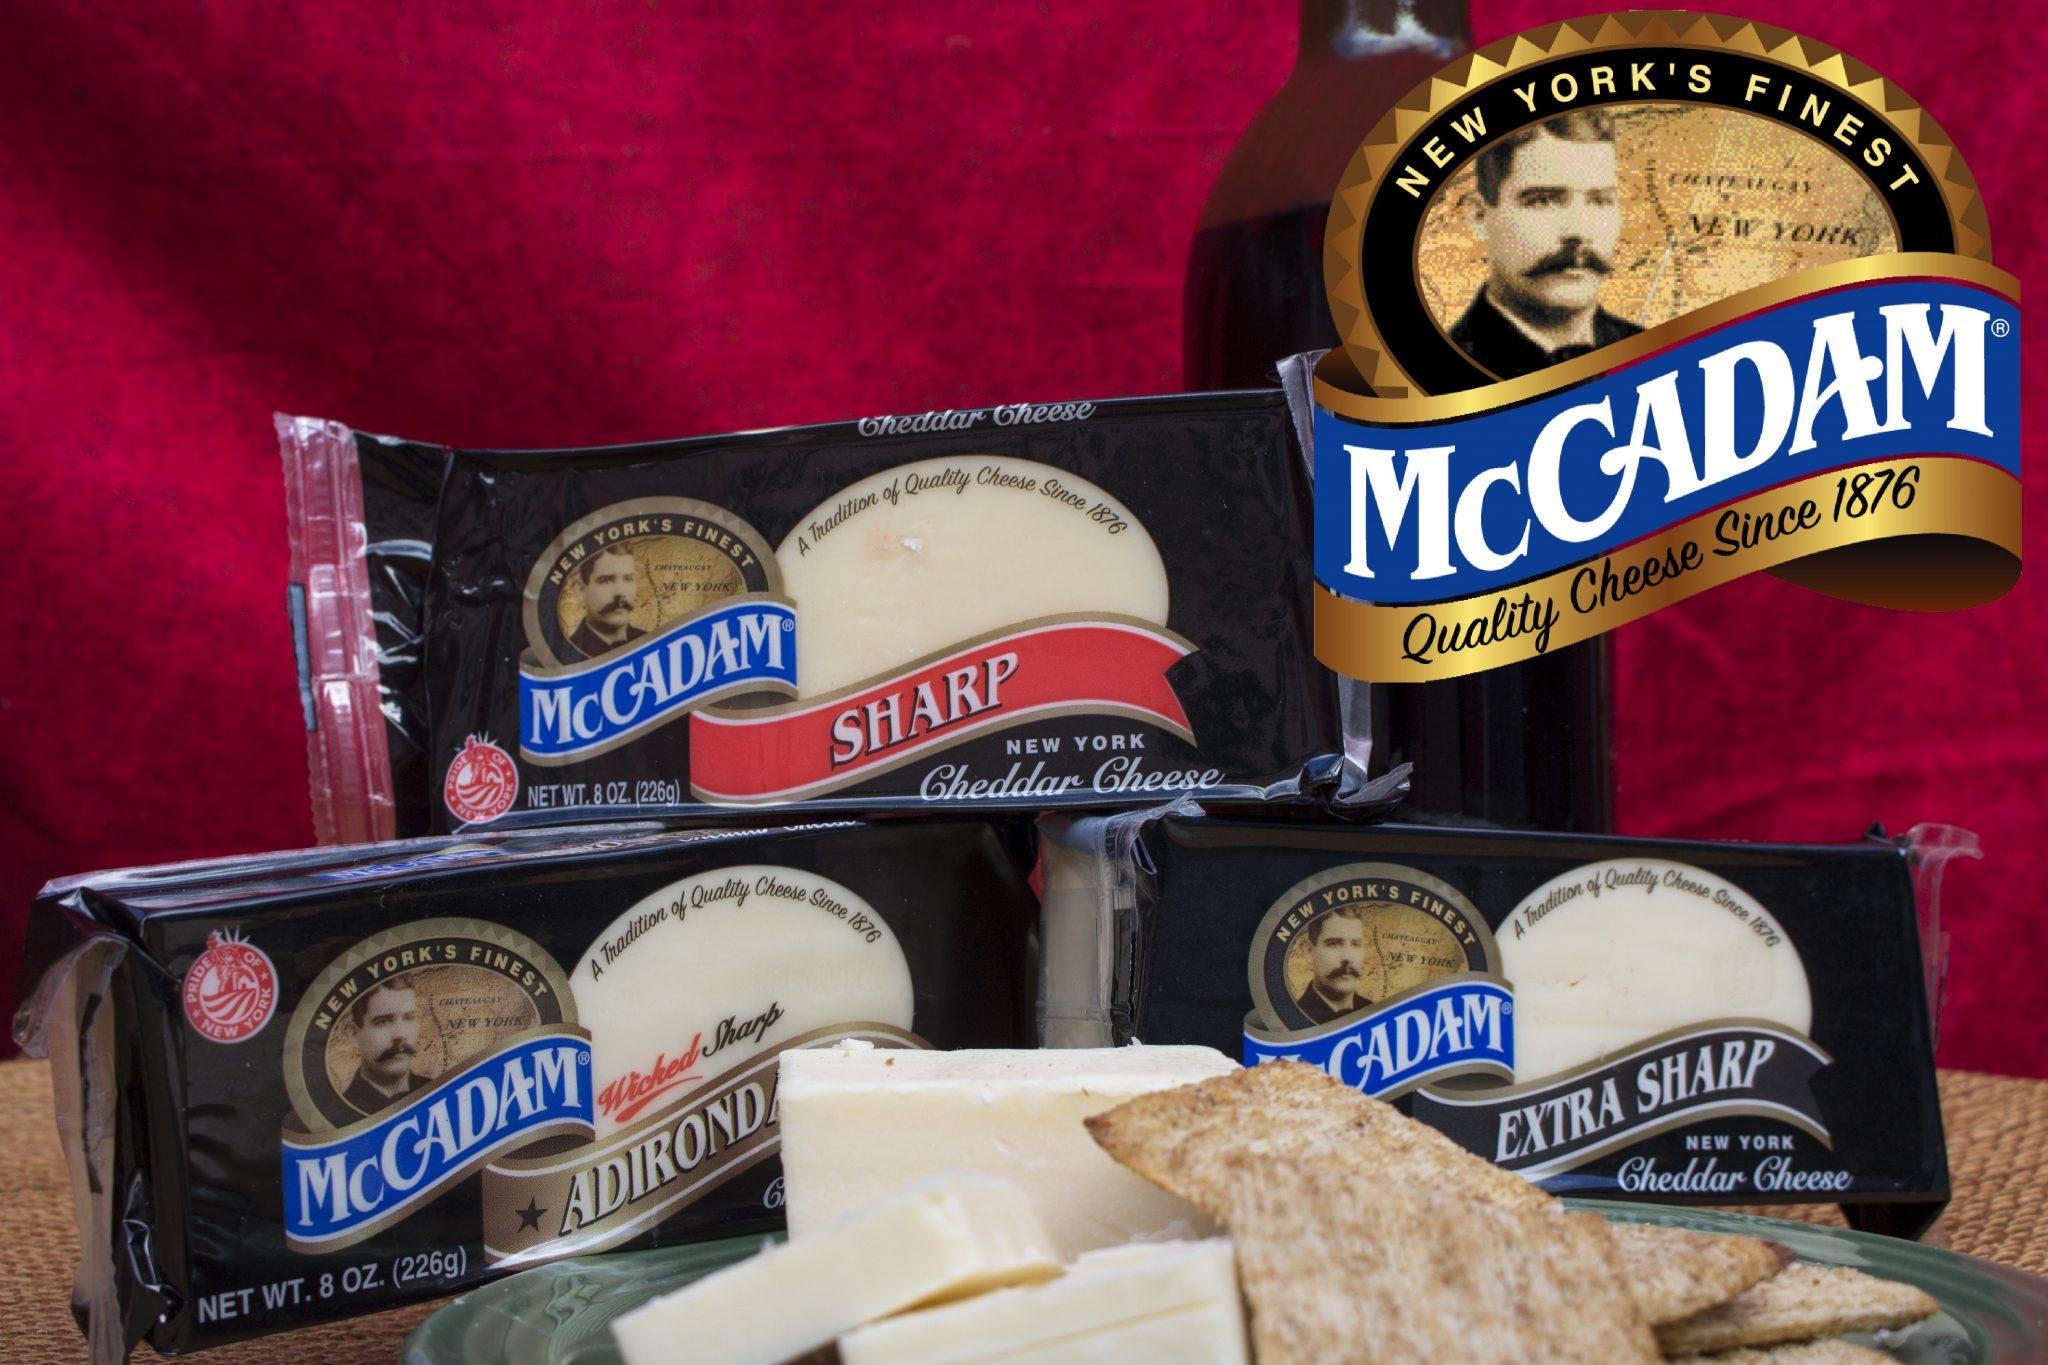 McCadam Cheese